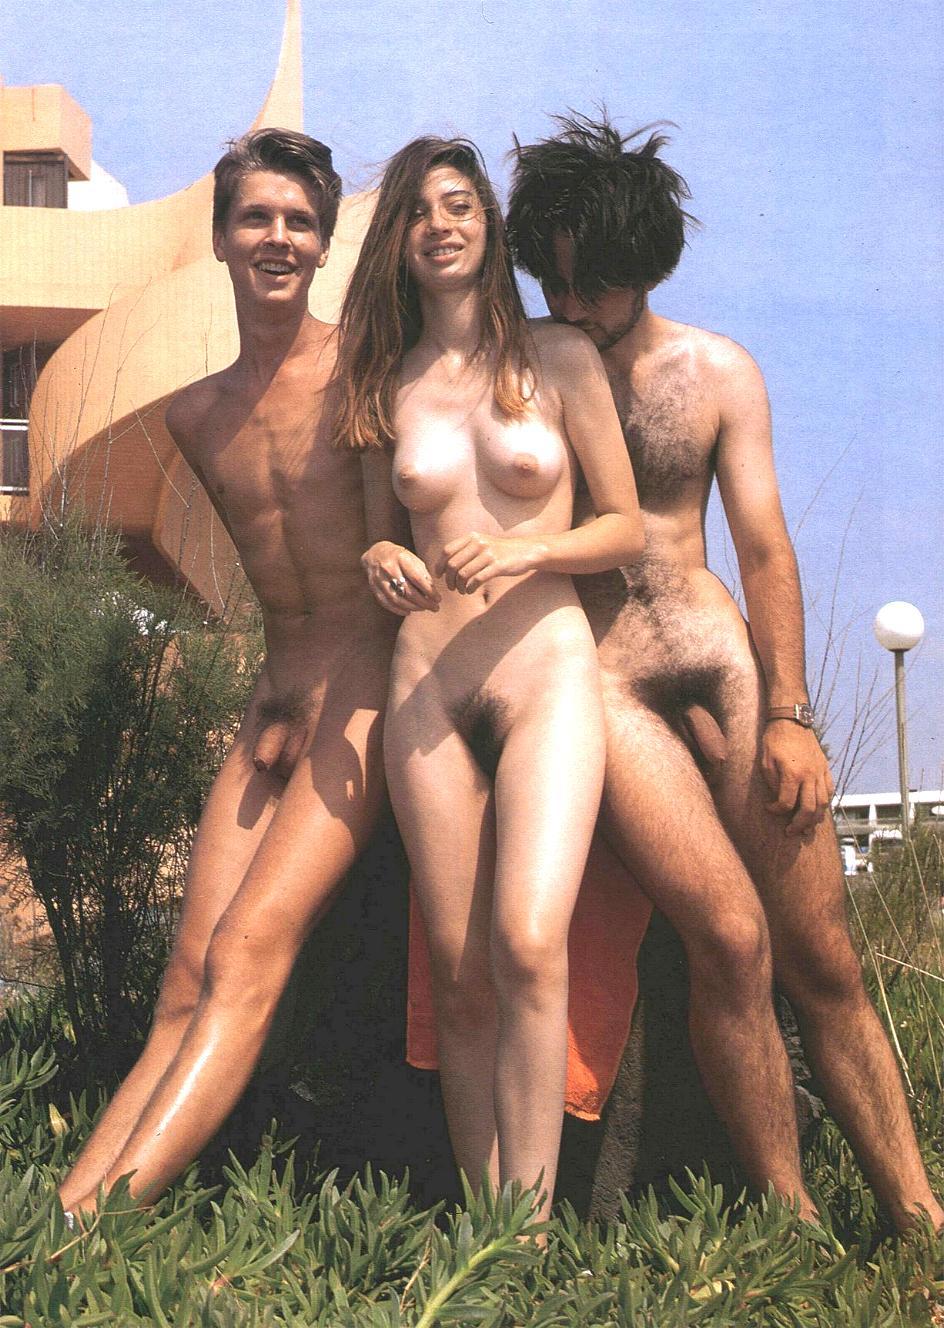 crazy bizarre nude photos